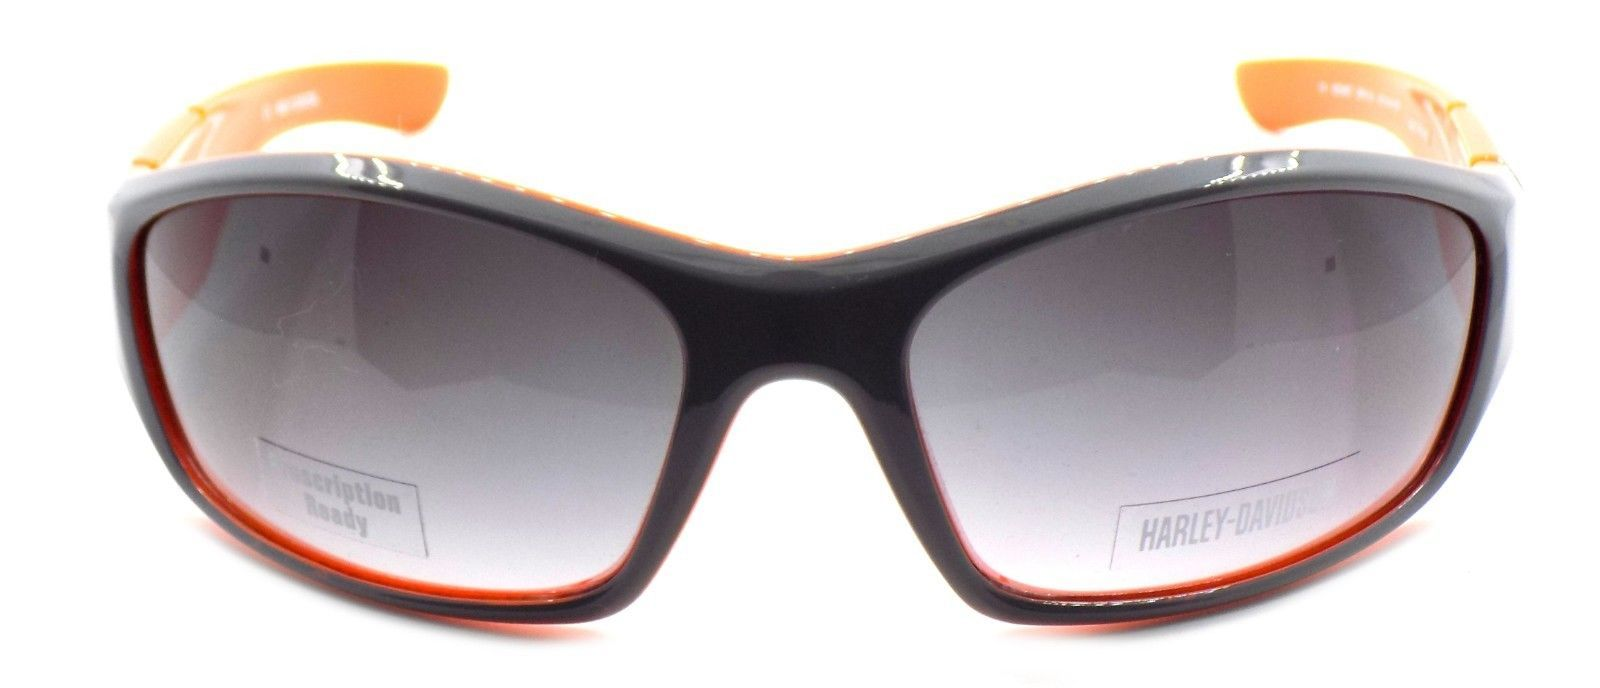 Harley Davidson HDX887 GRY Wraparound Sunglasses Gray 67-19-120 Smoke Gradient